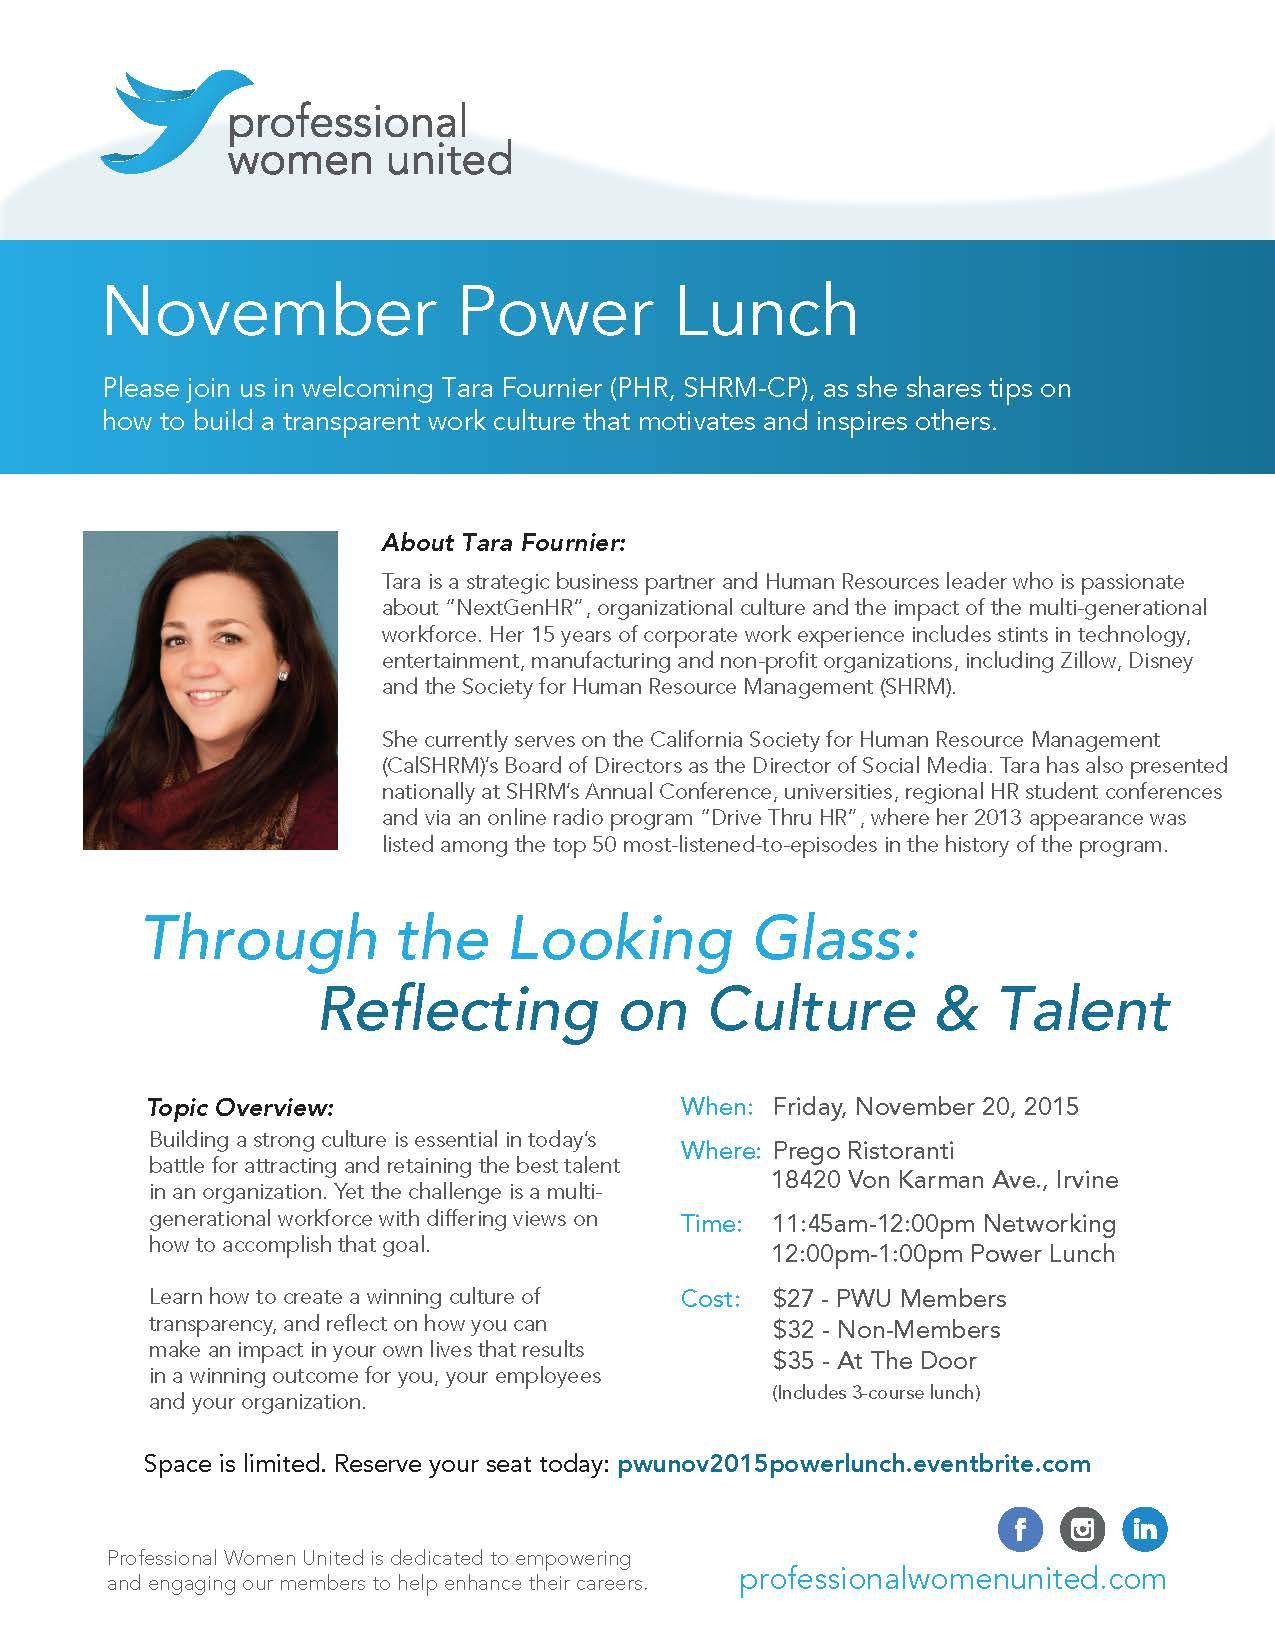 November Power Lunch Flyer